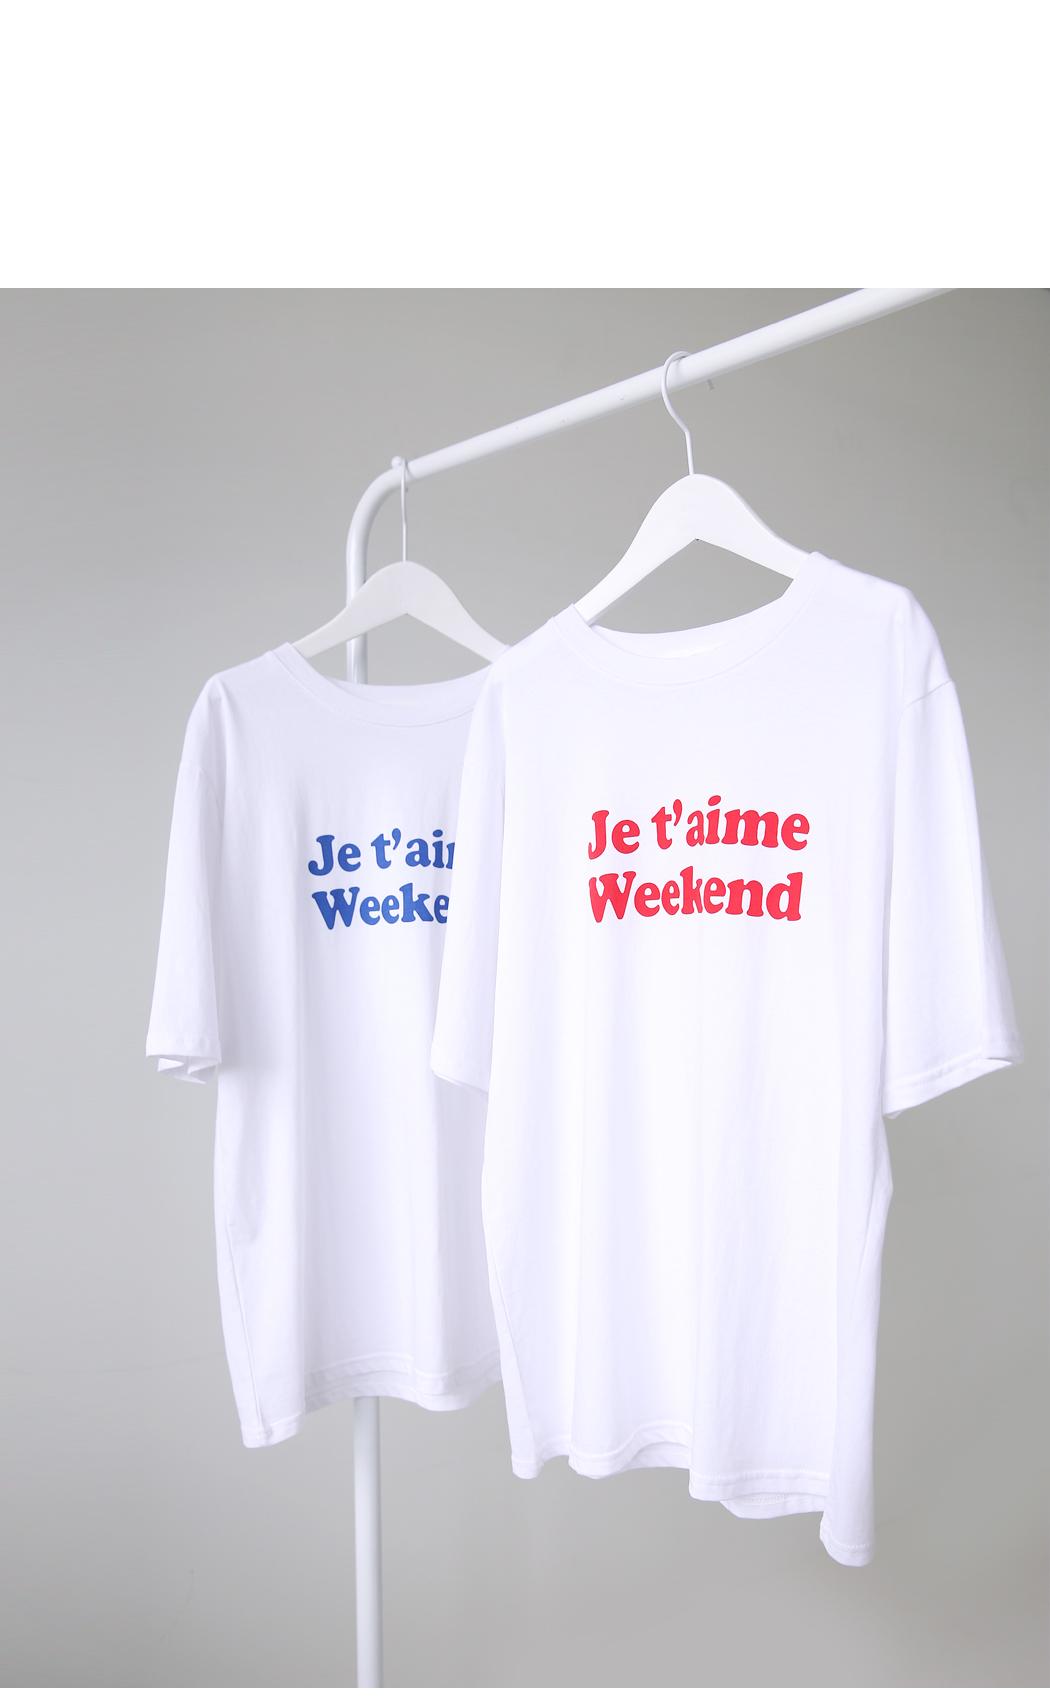 'Je t'aime' printing short sleeve tee